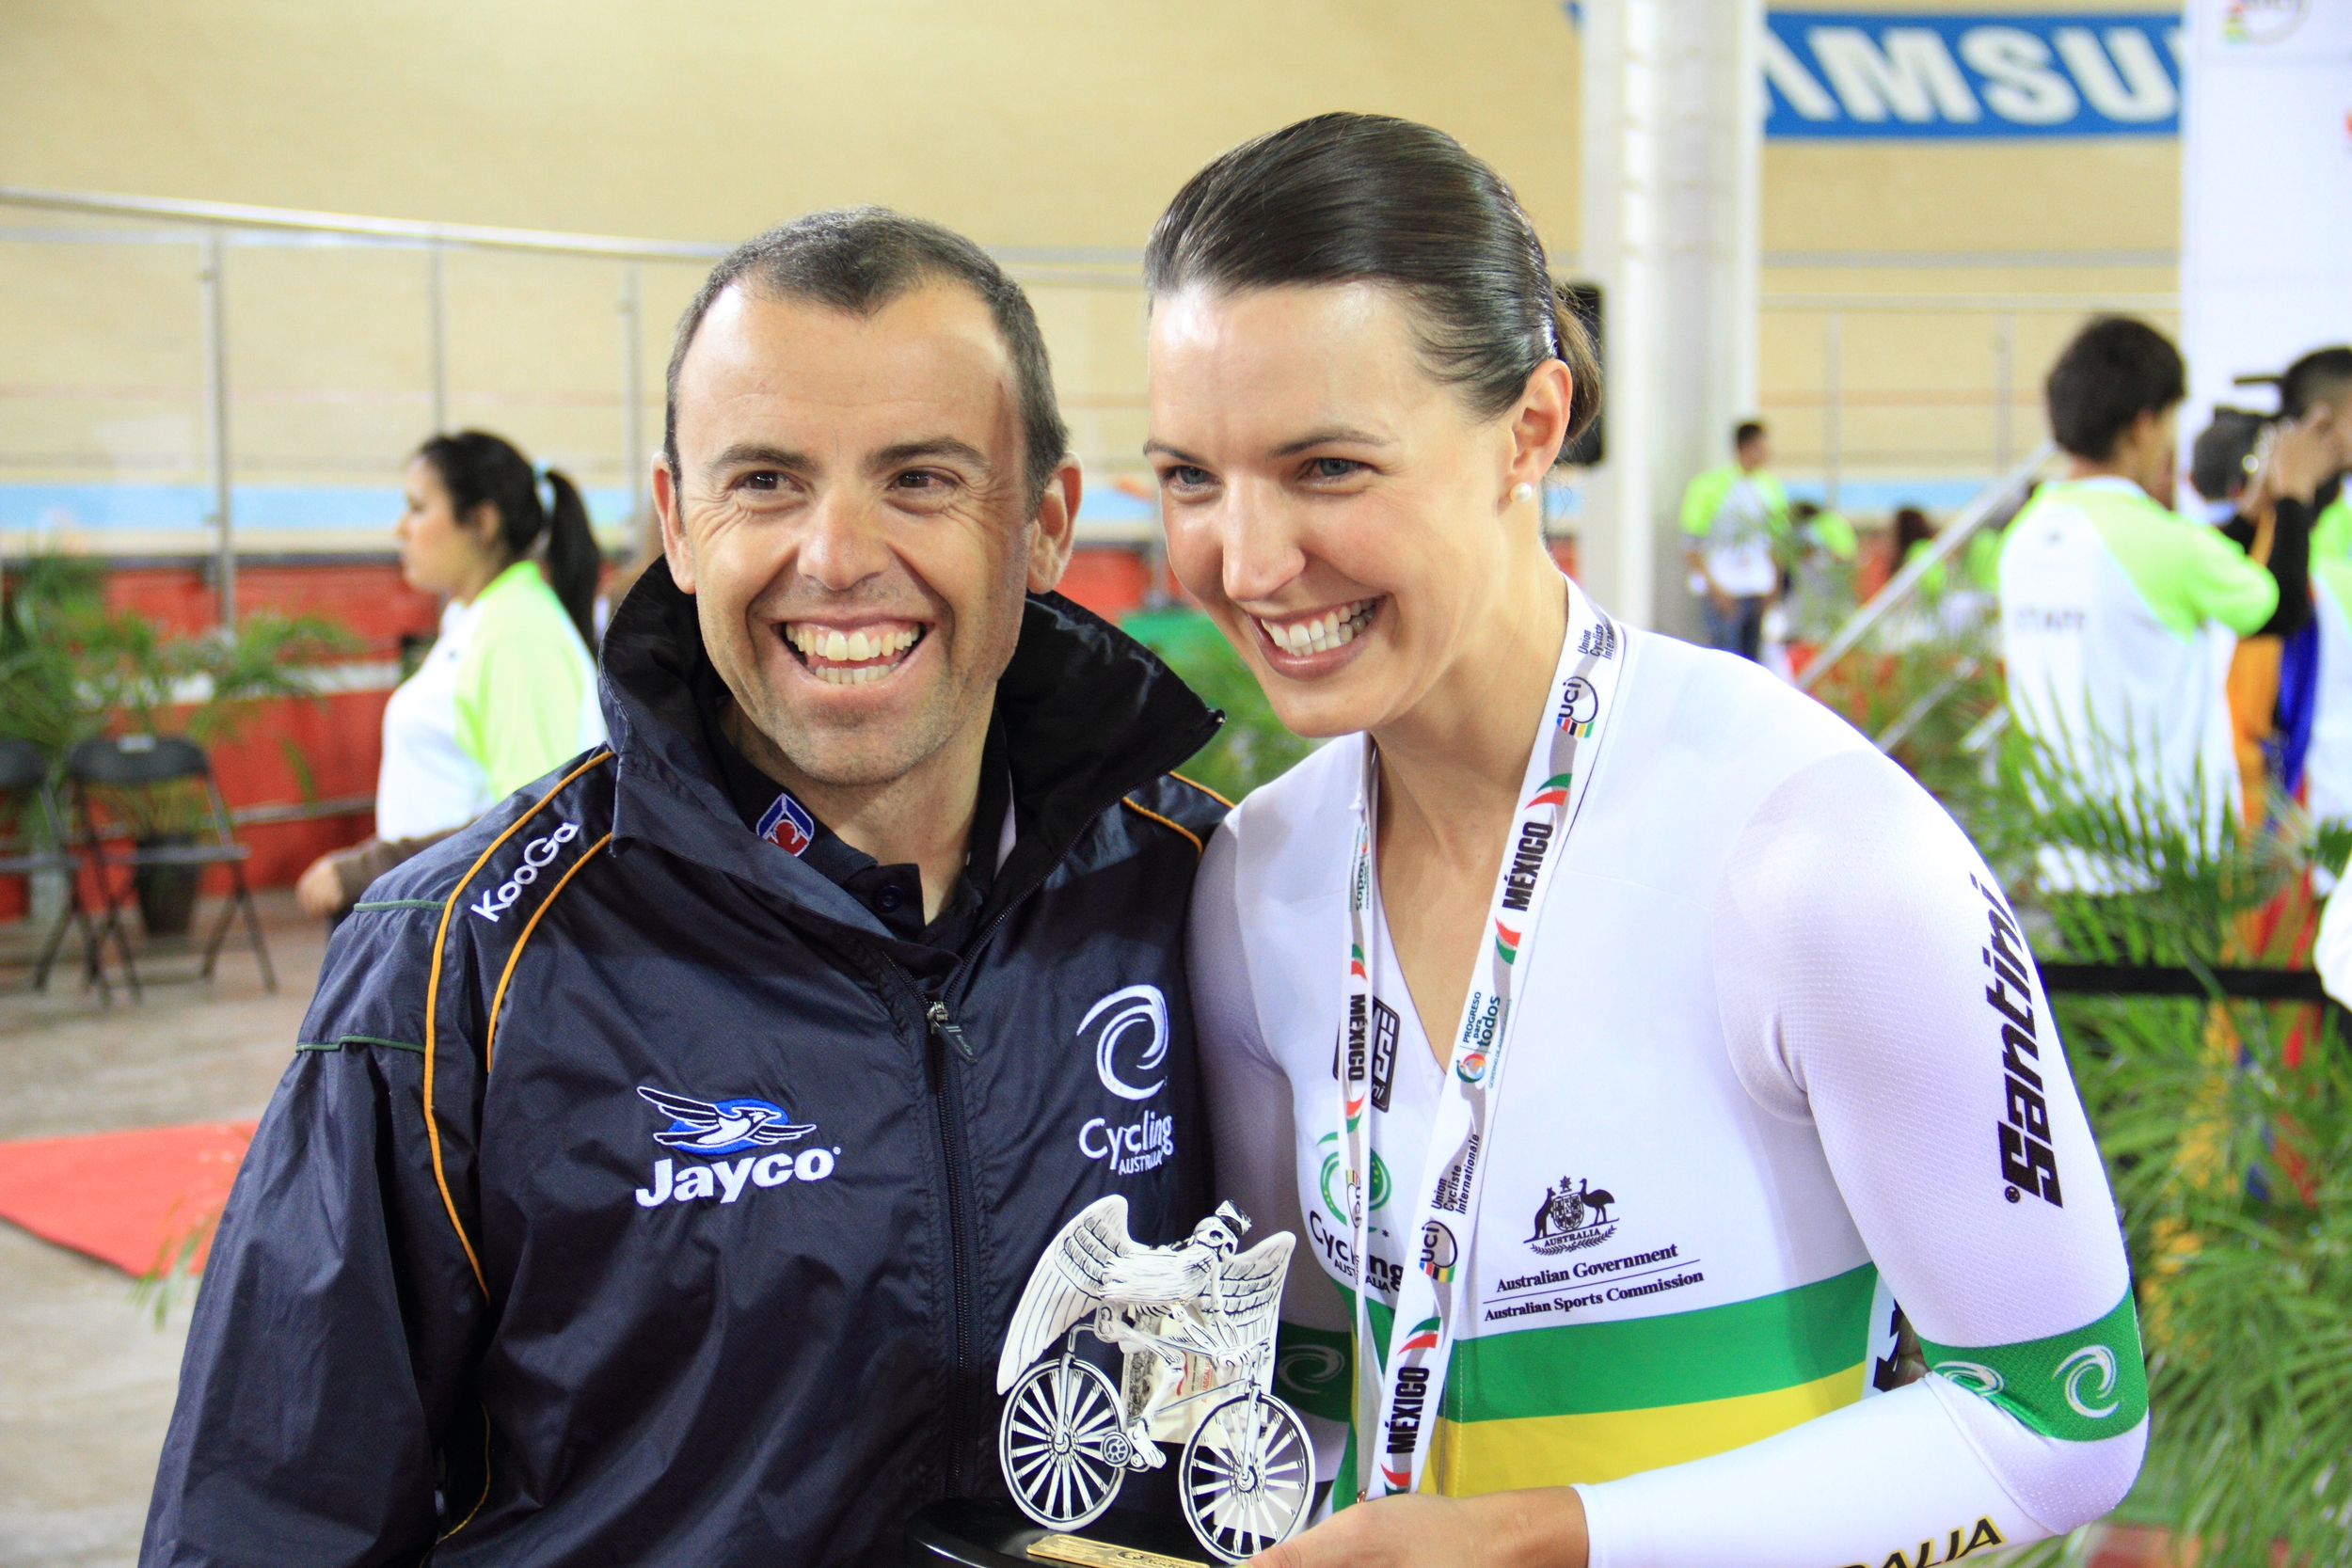 2013 Track World Cup – Aguascalientes